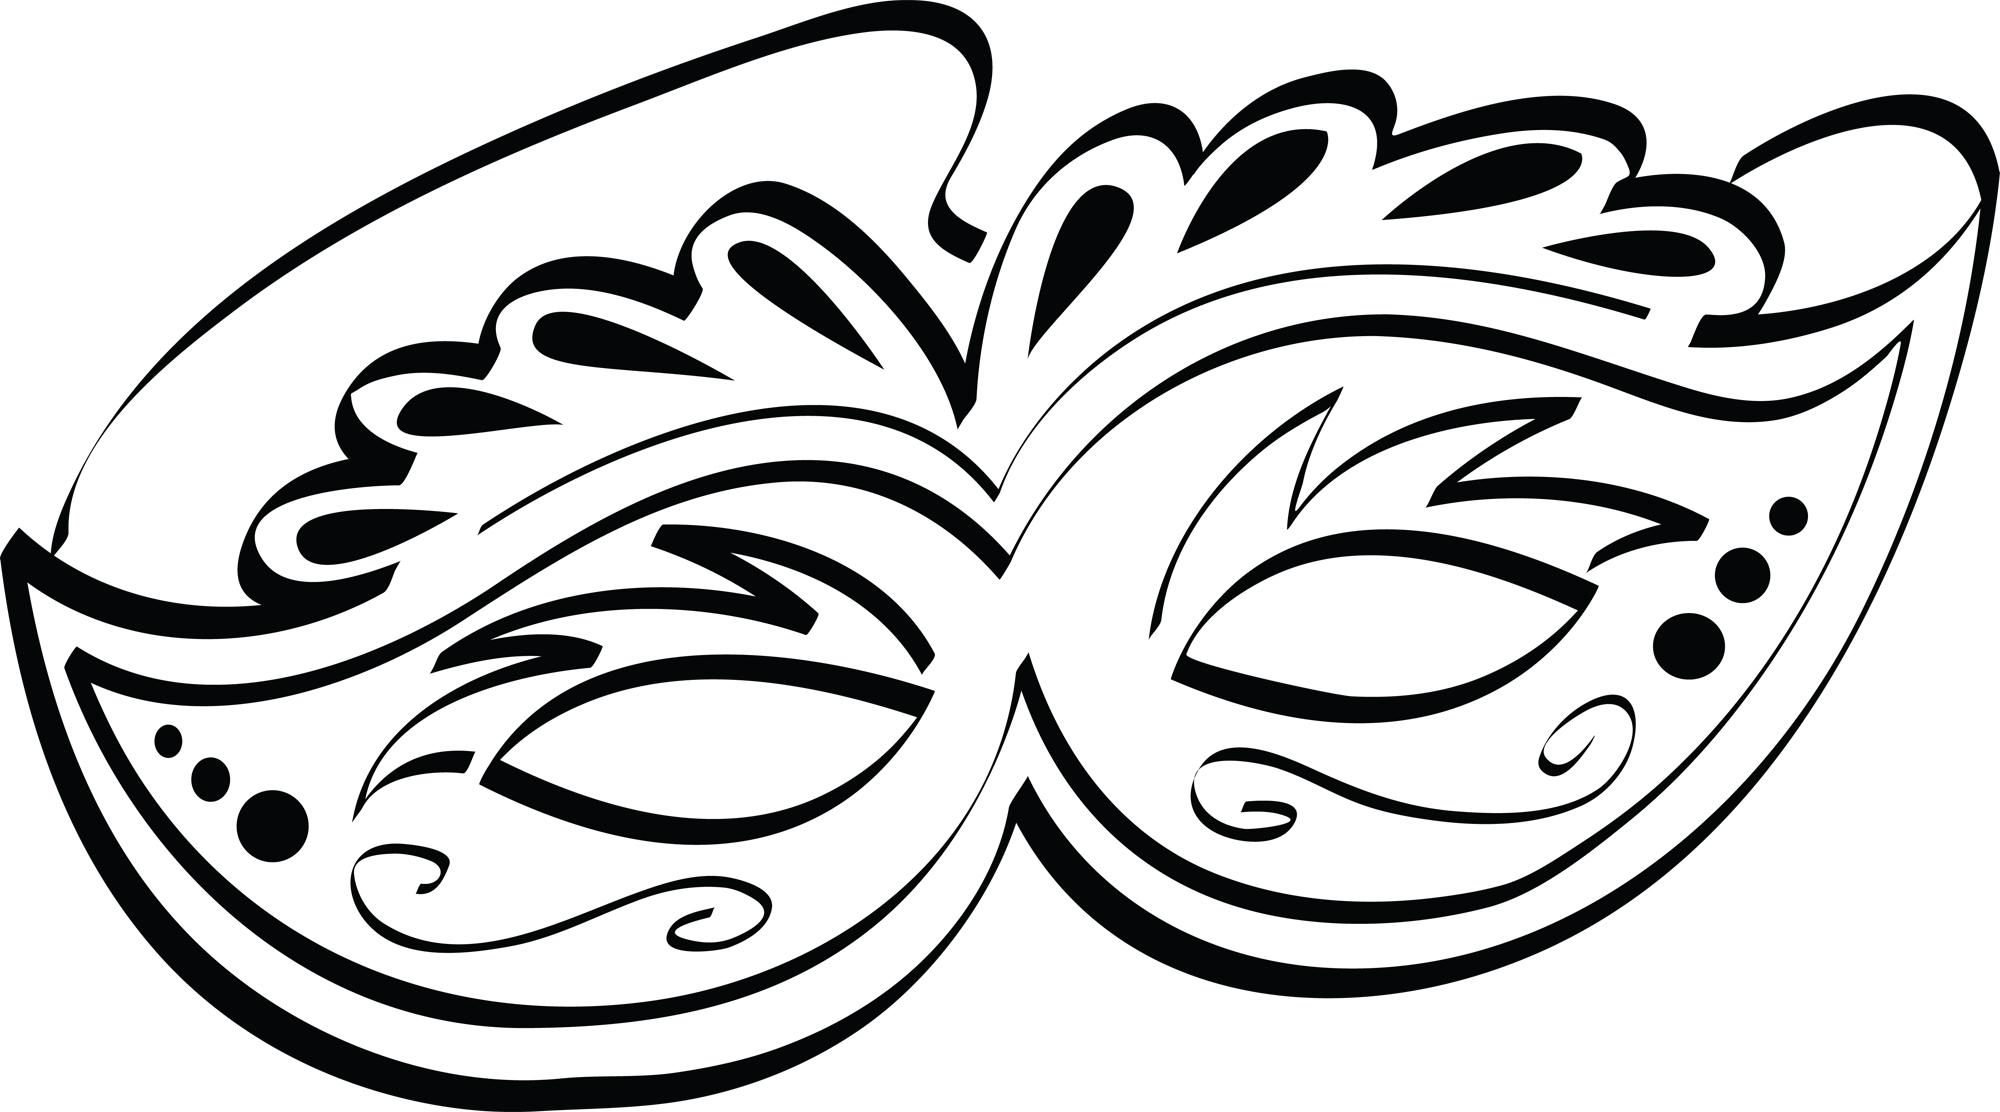 Mardi Gras Mask Carnival Koozies